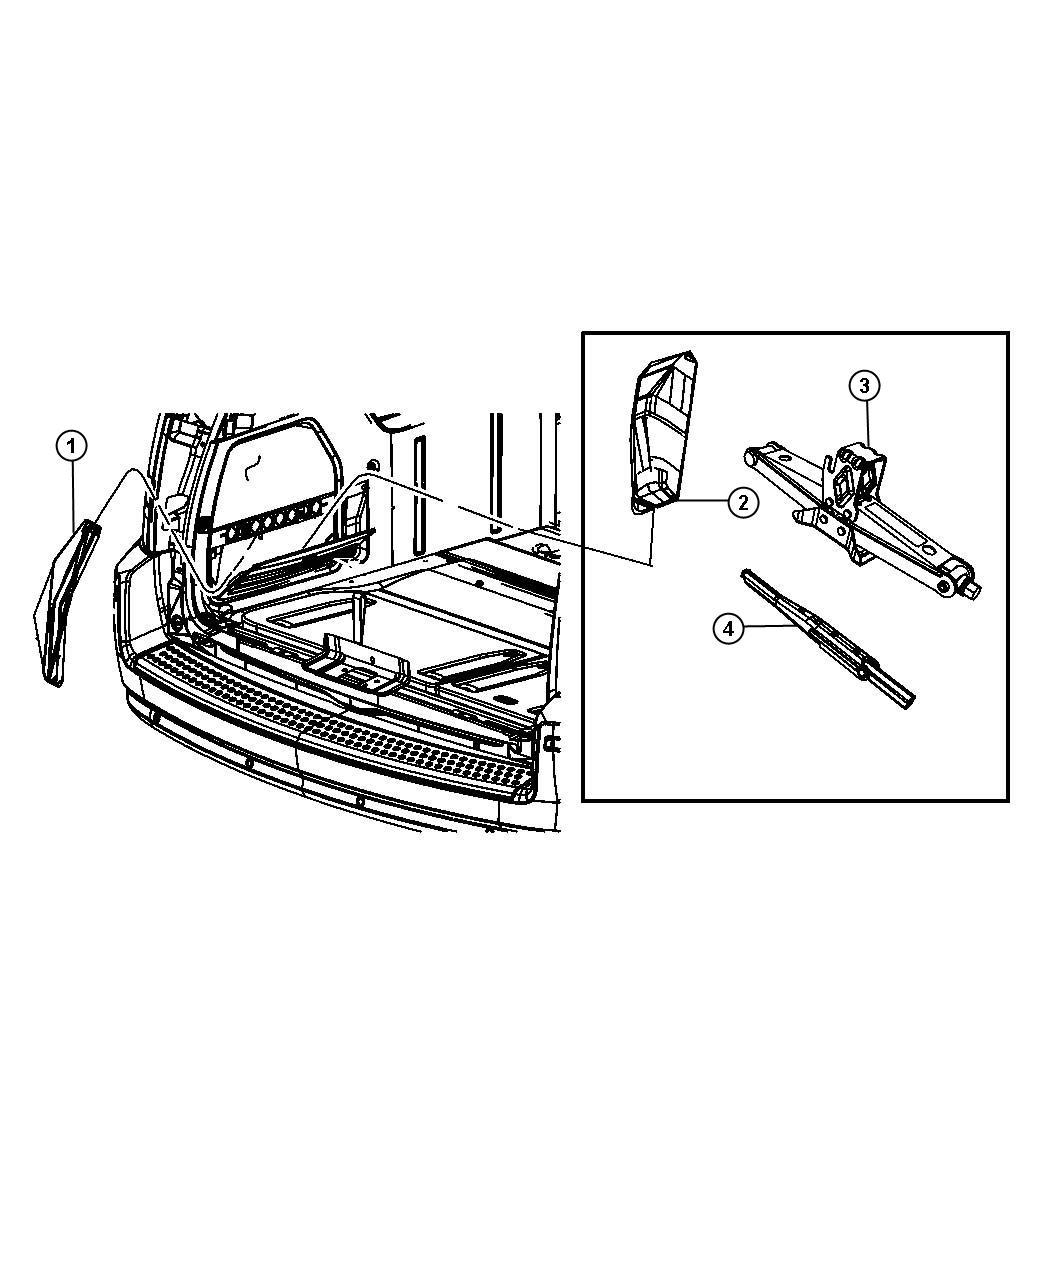 2008 Dodge Grand Caravan Jack. Scissors. [tbt] or [compact